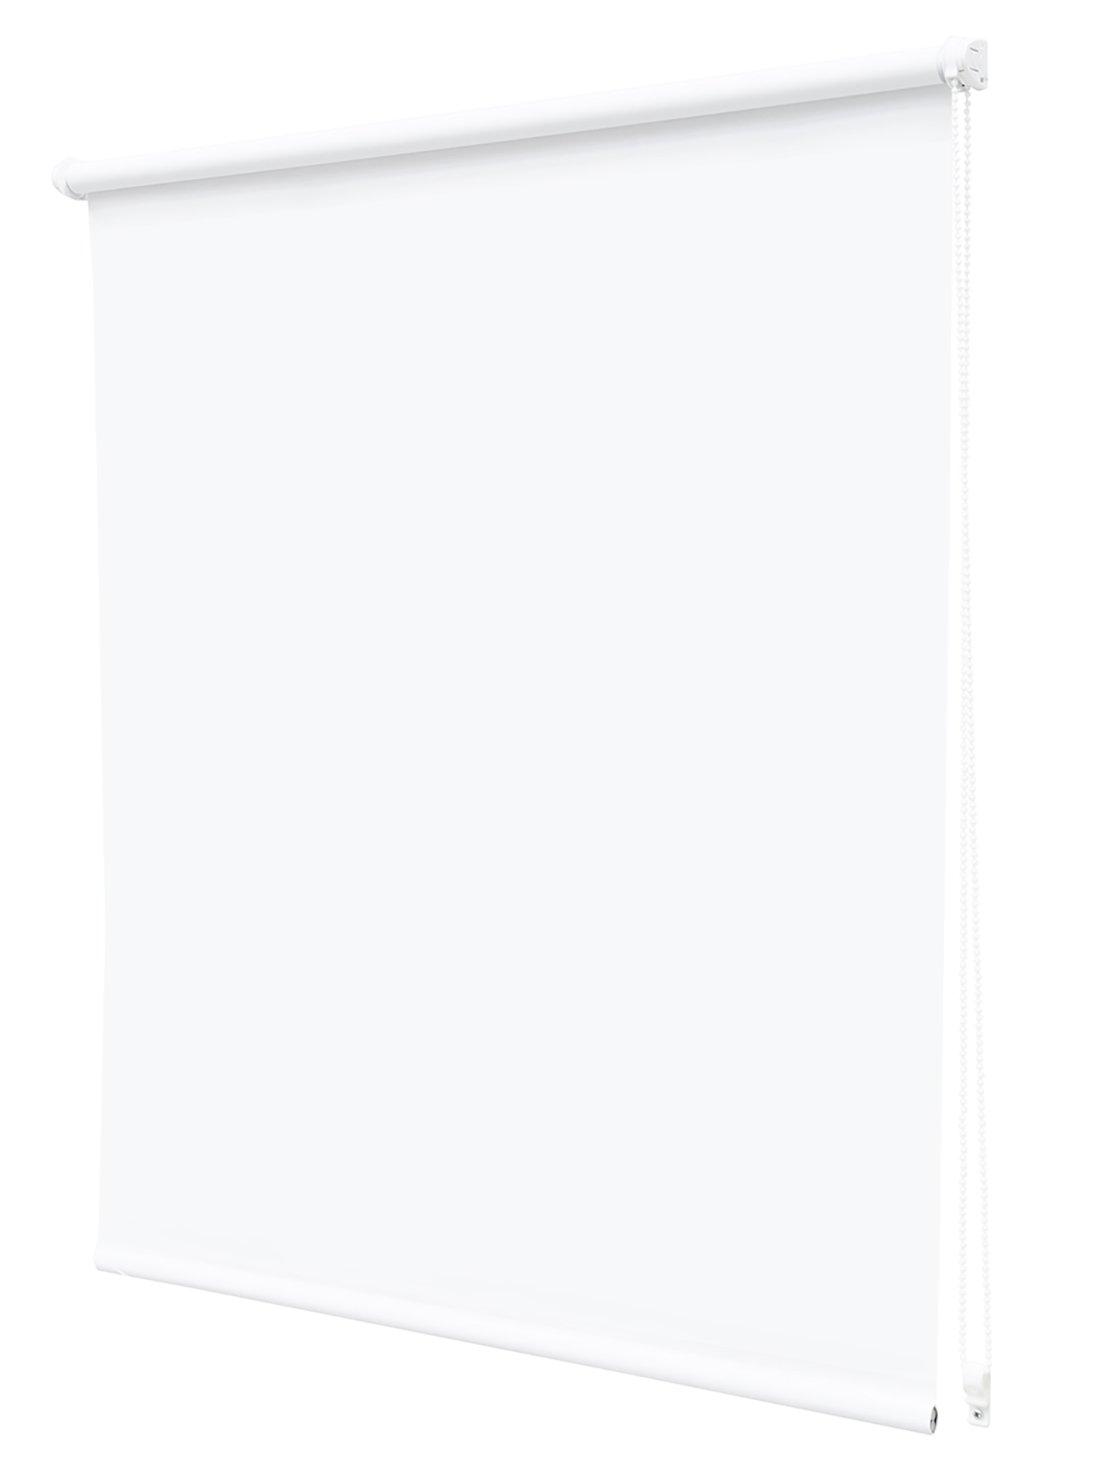 Intensions Haute Easy Fix Store Enrouleur occultant uni Blanc 65x 170cm Brand 1186281